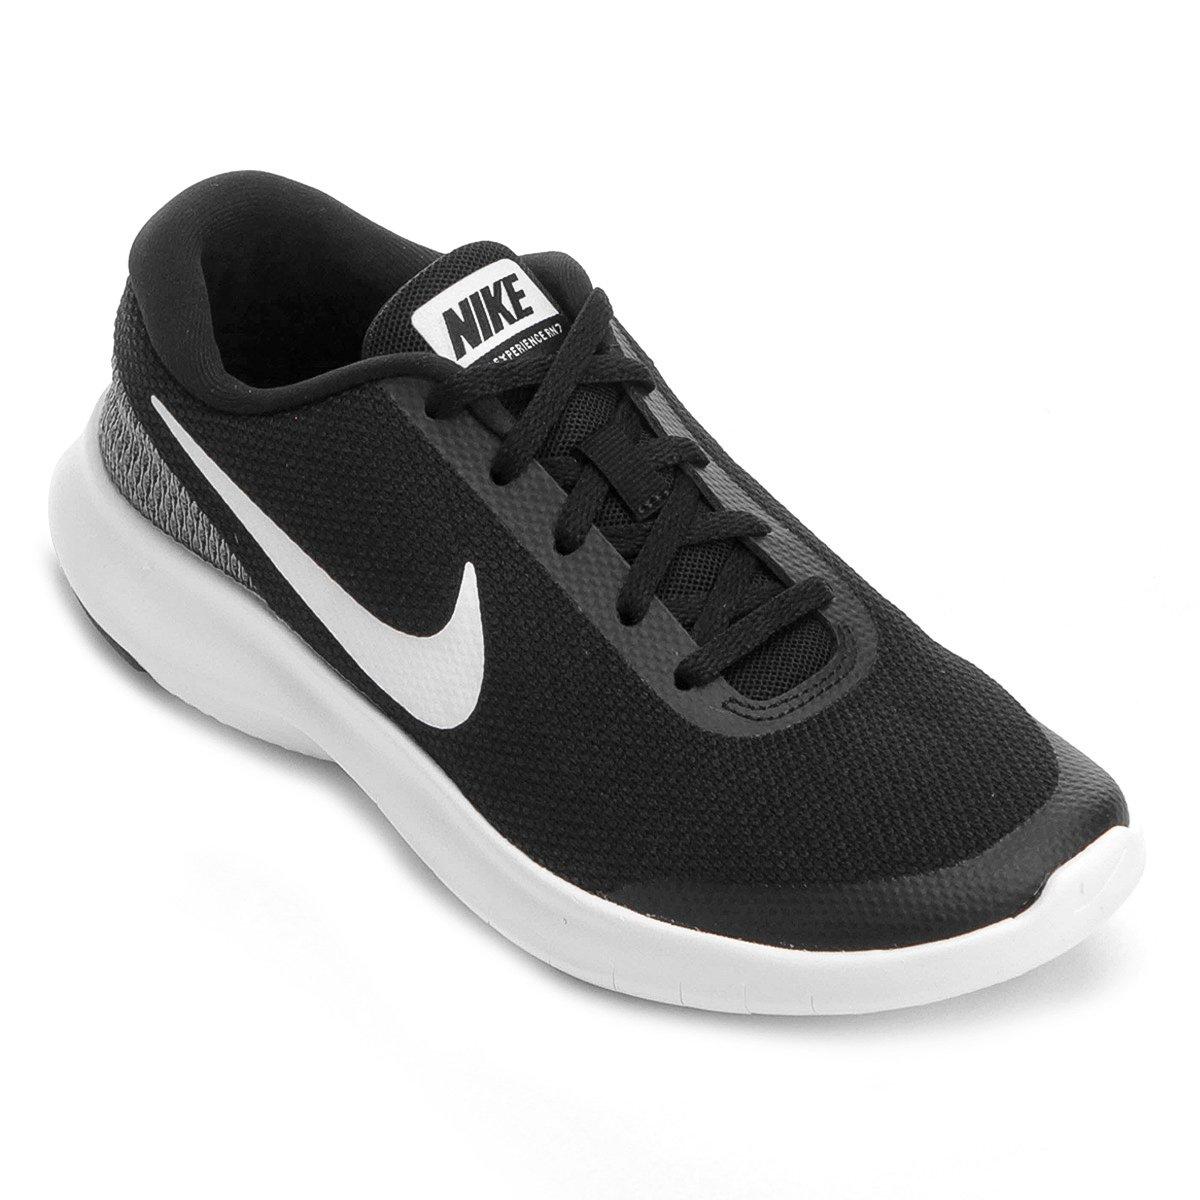 30102649d70 Tênis Nike Flex Experience RN 7 Feminino - Preto e Branco - Compre Agora